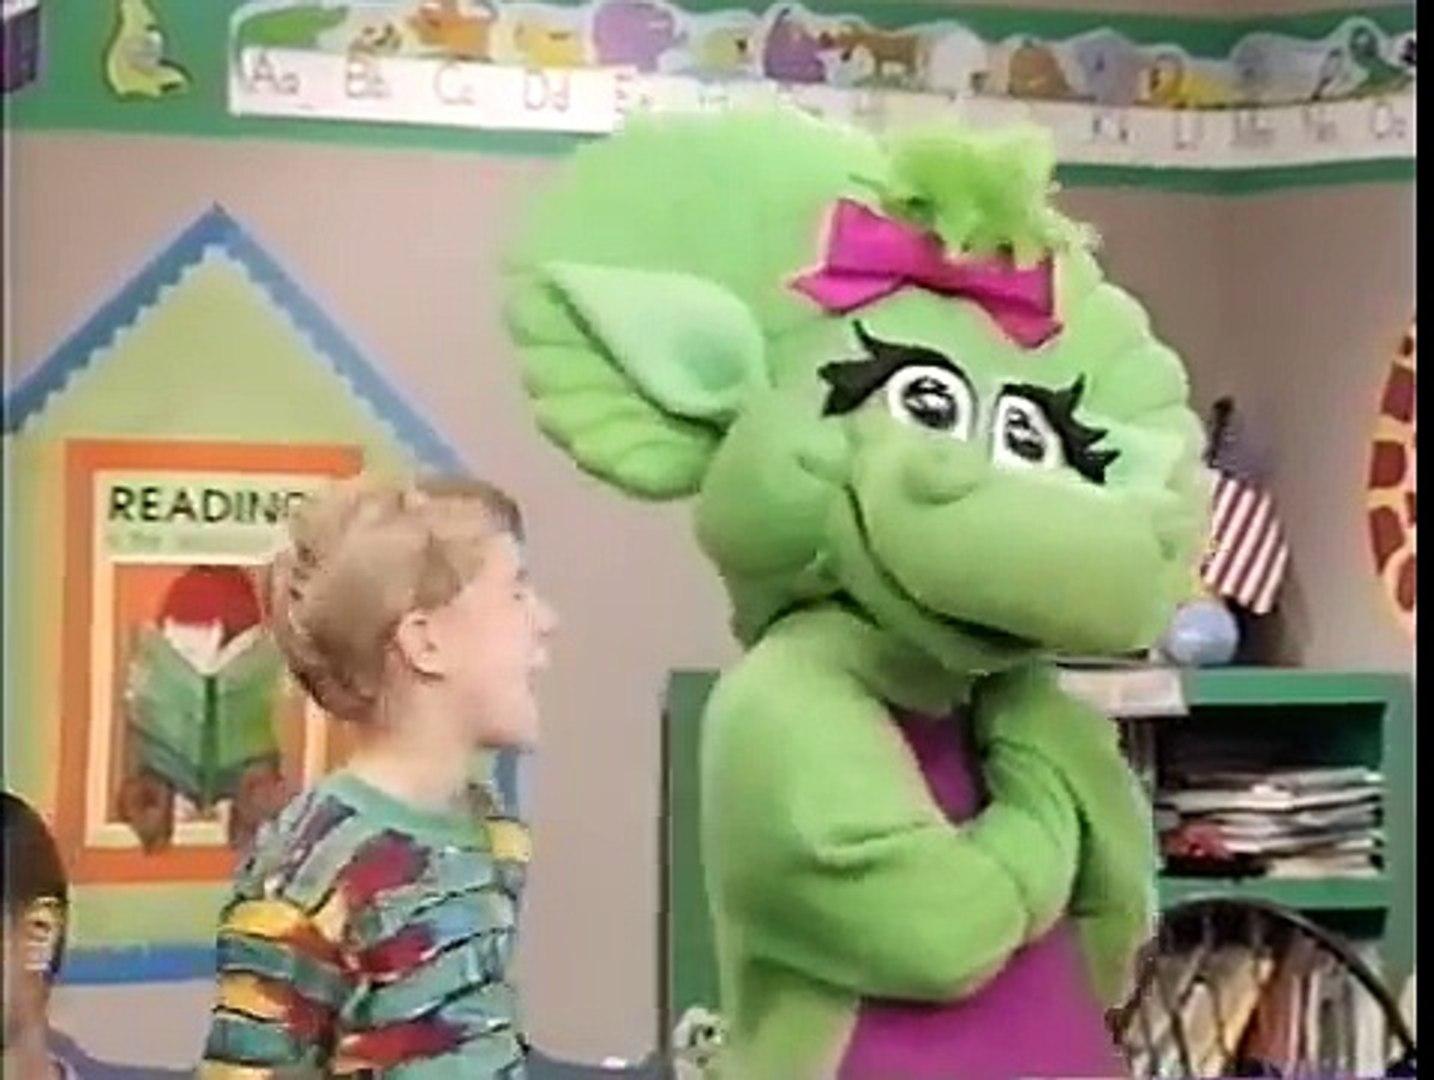 Barney & Friends: Everyone Is Special (Season 1, Episode 30)